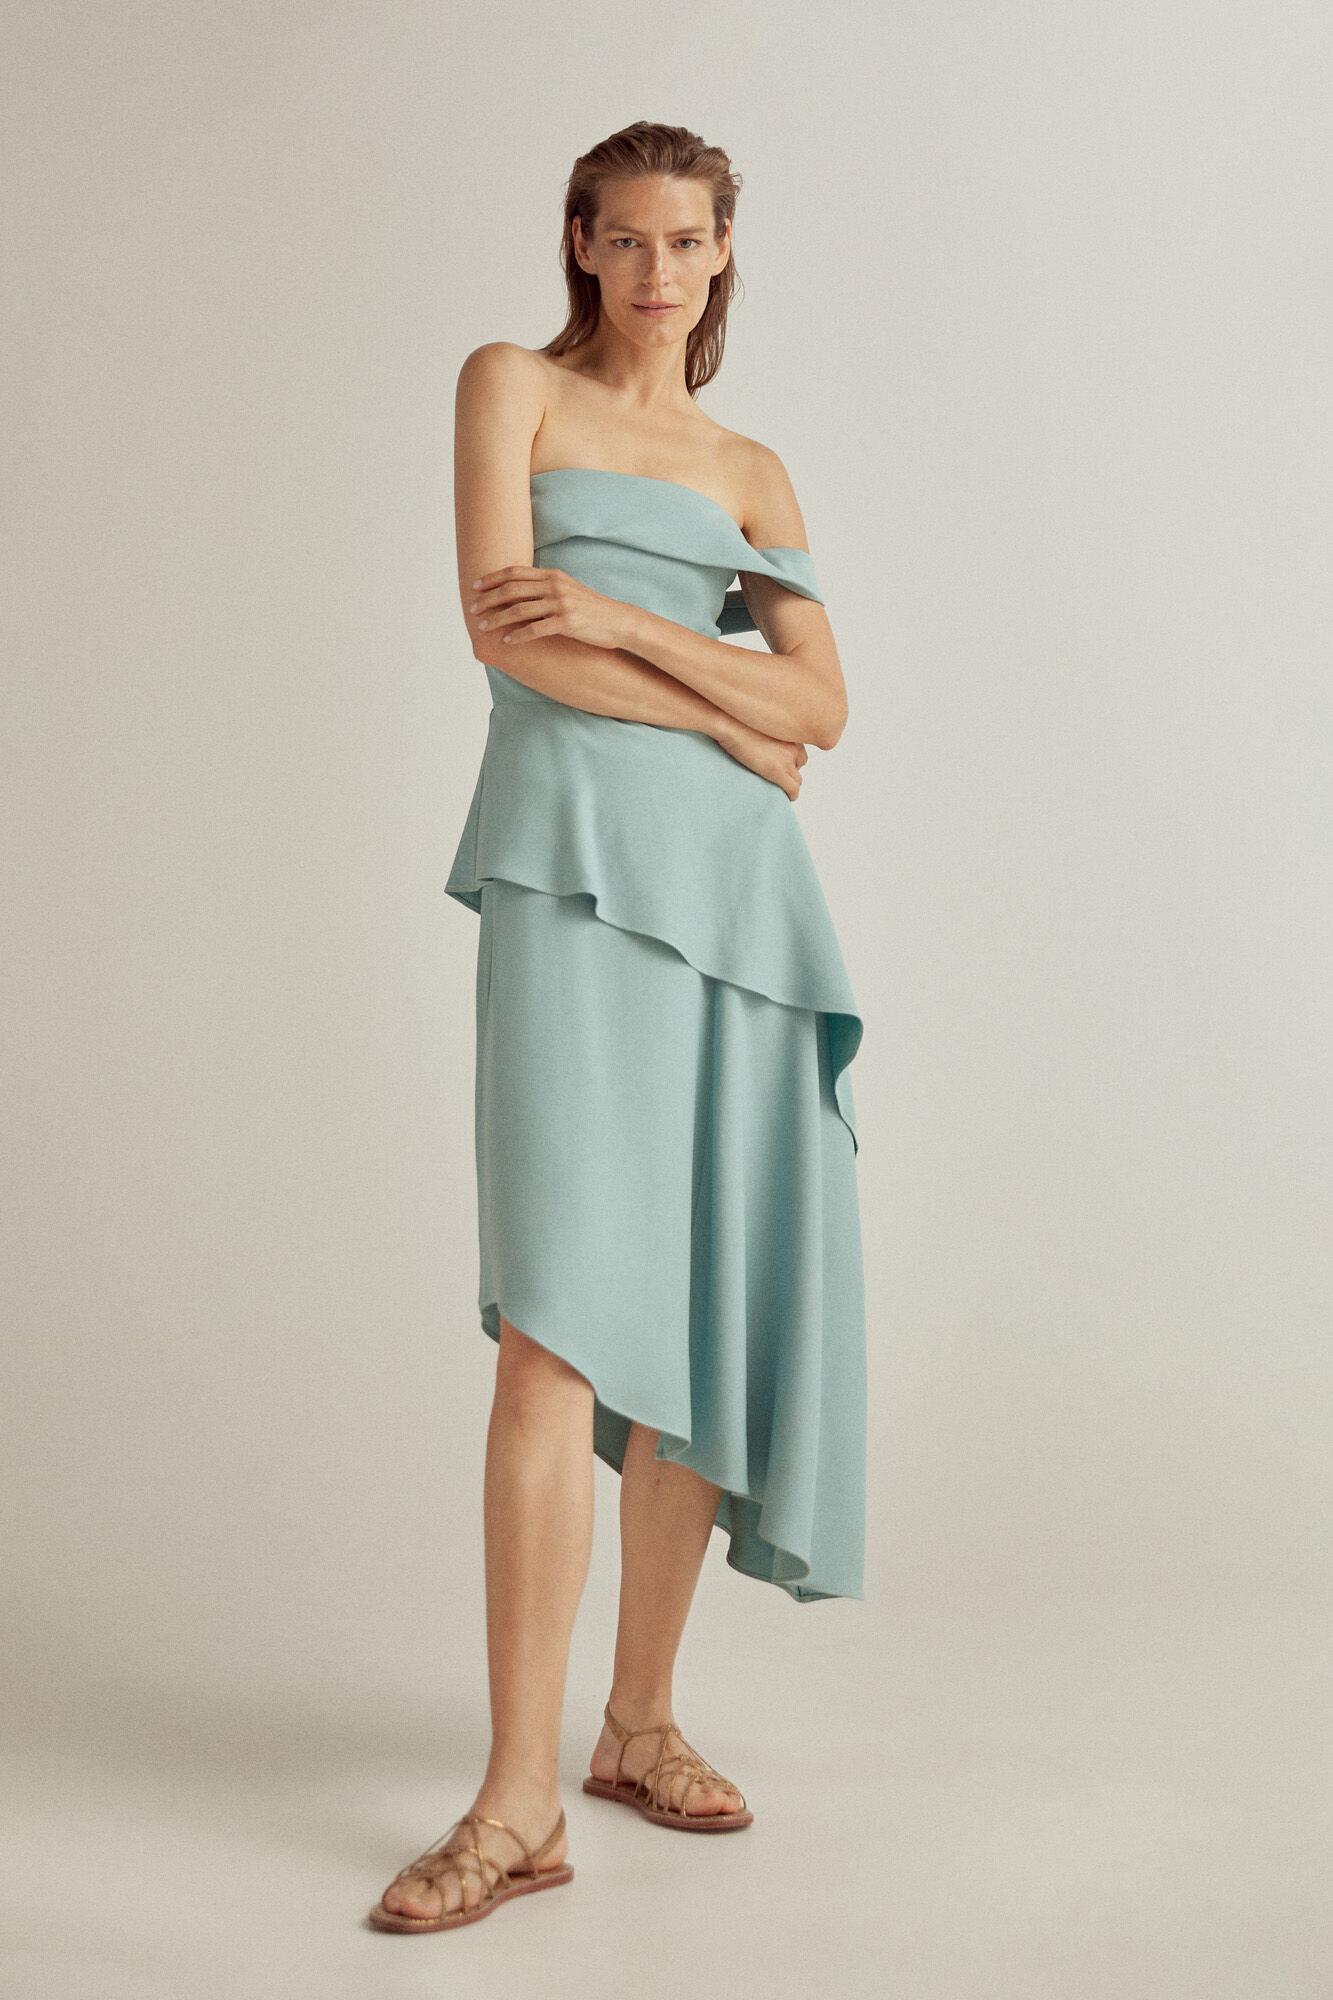 Vestido asimétrico azul cielo